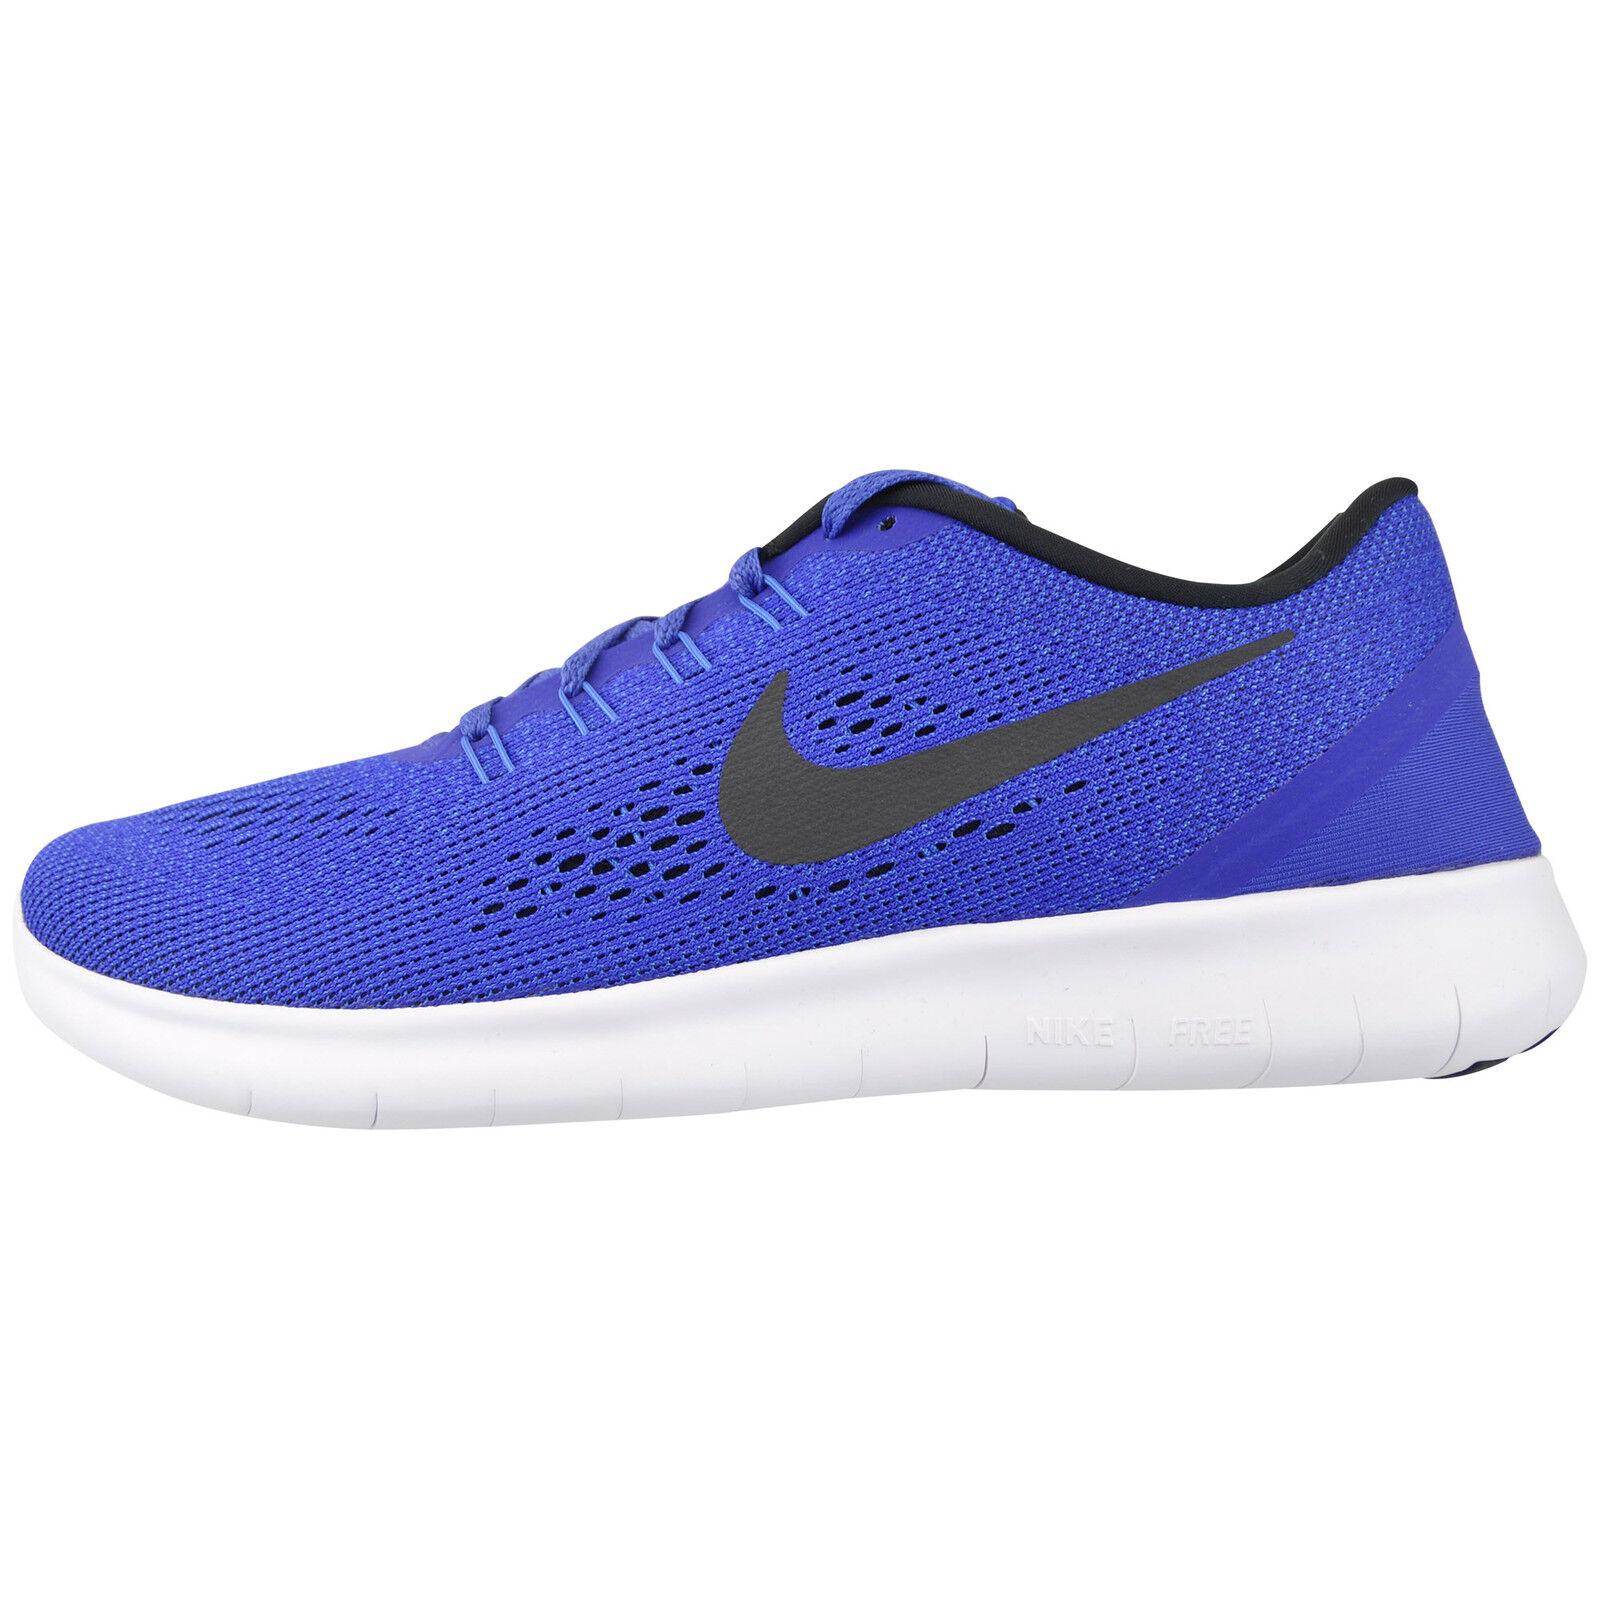 Nike 831508-400 Free RN 831508-400 Nike Running Jogging Sneaker Freizeit Laufschuhe 573cef